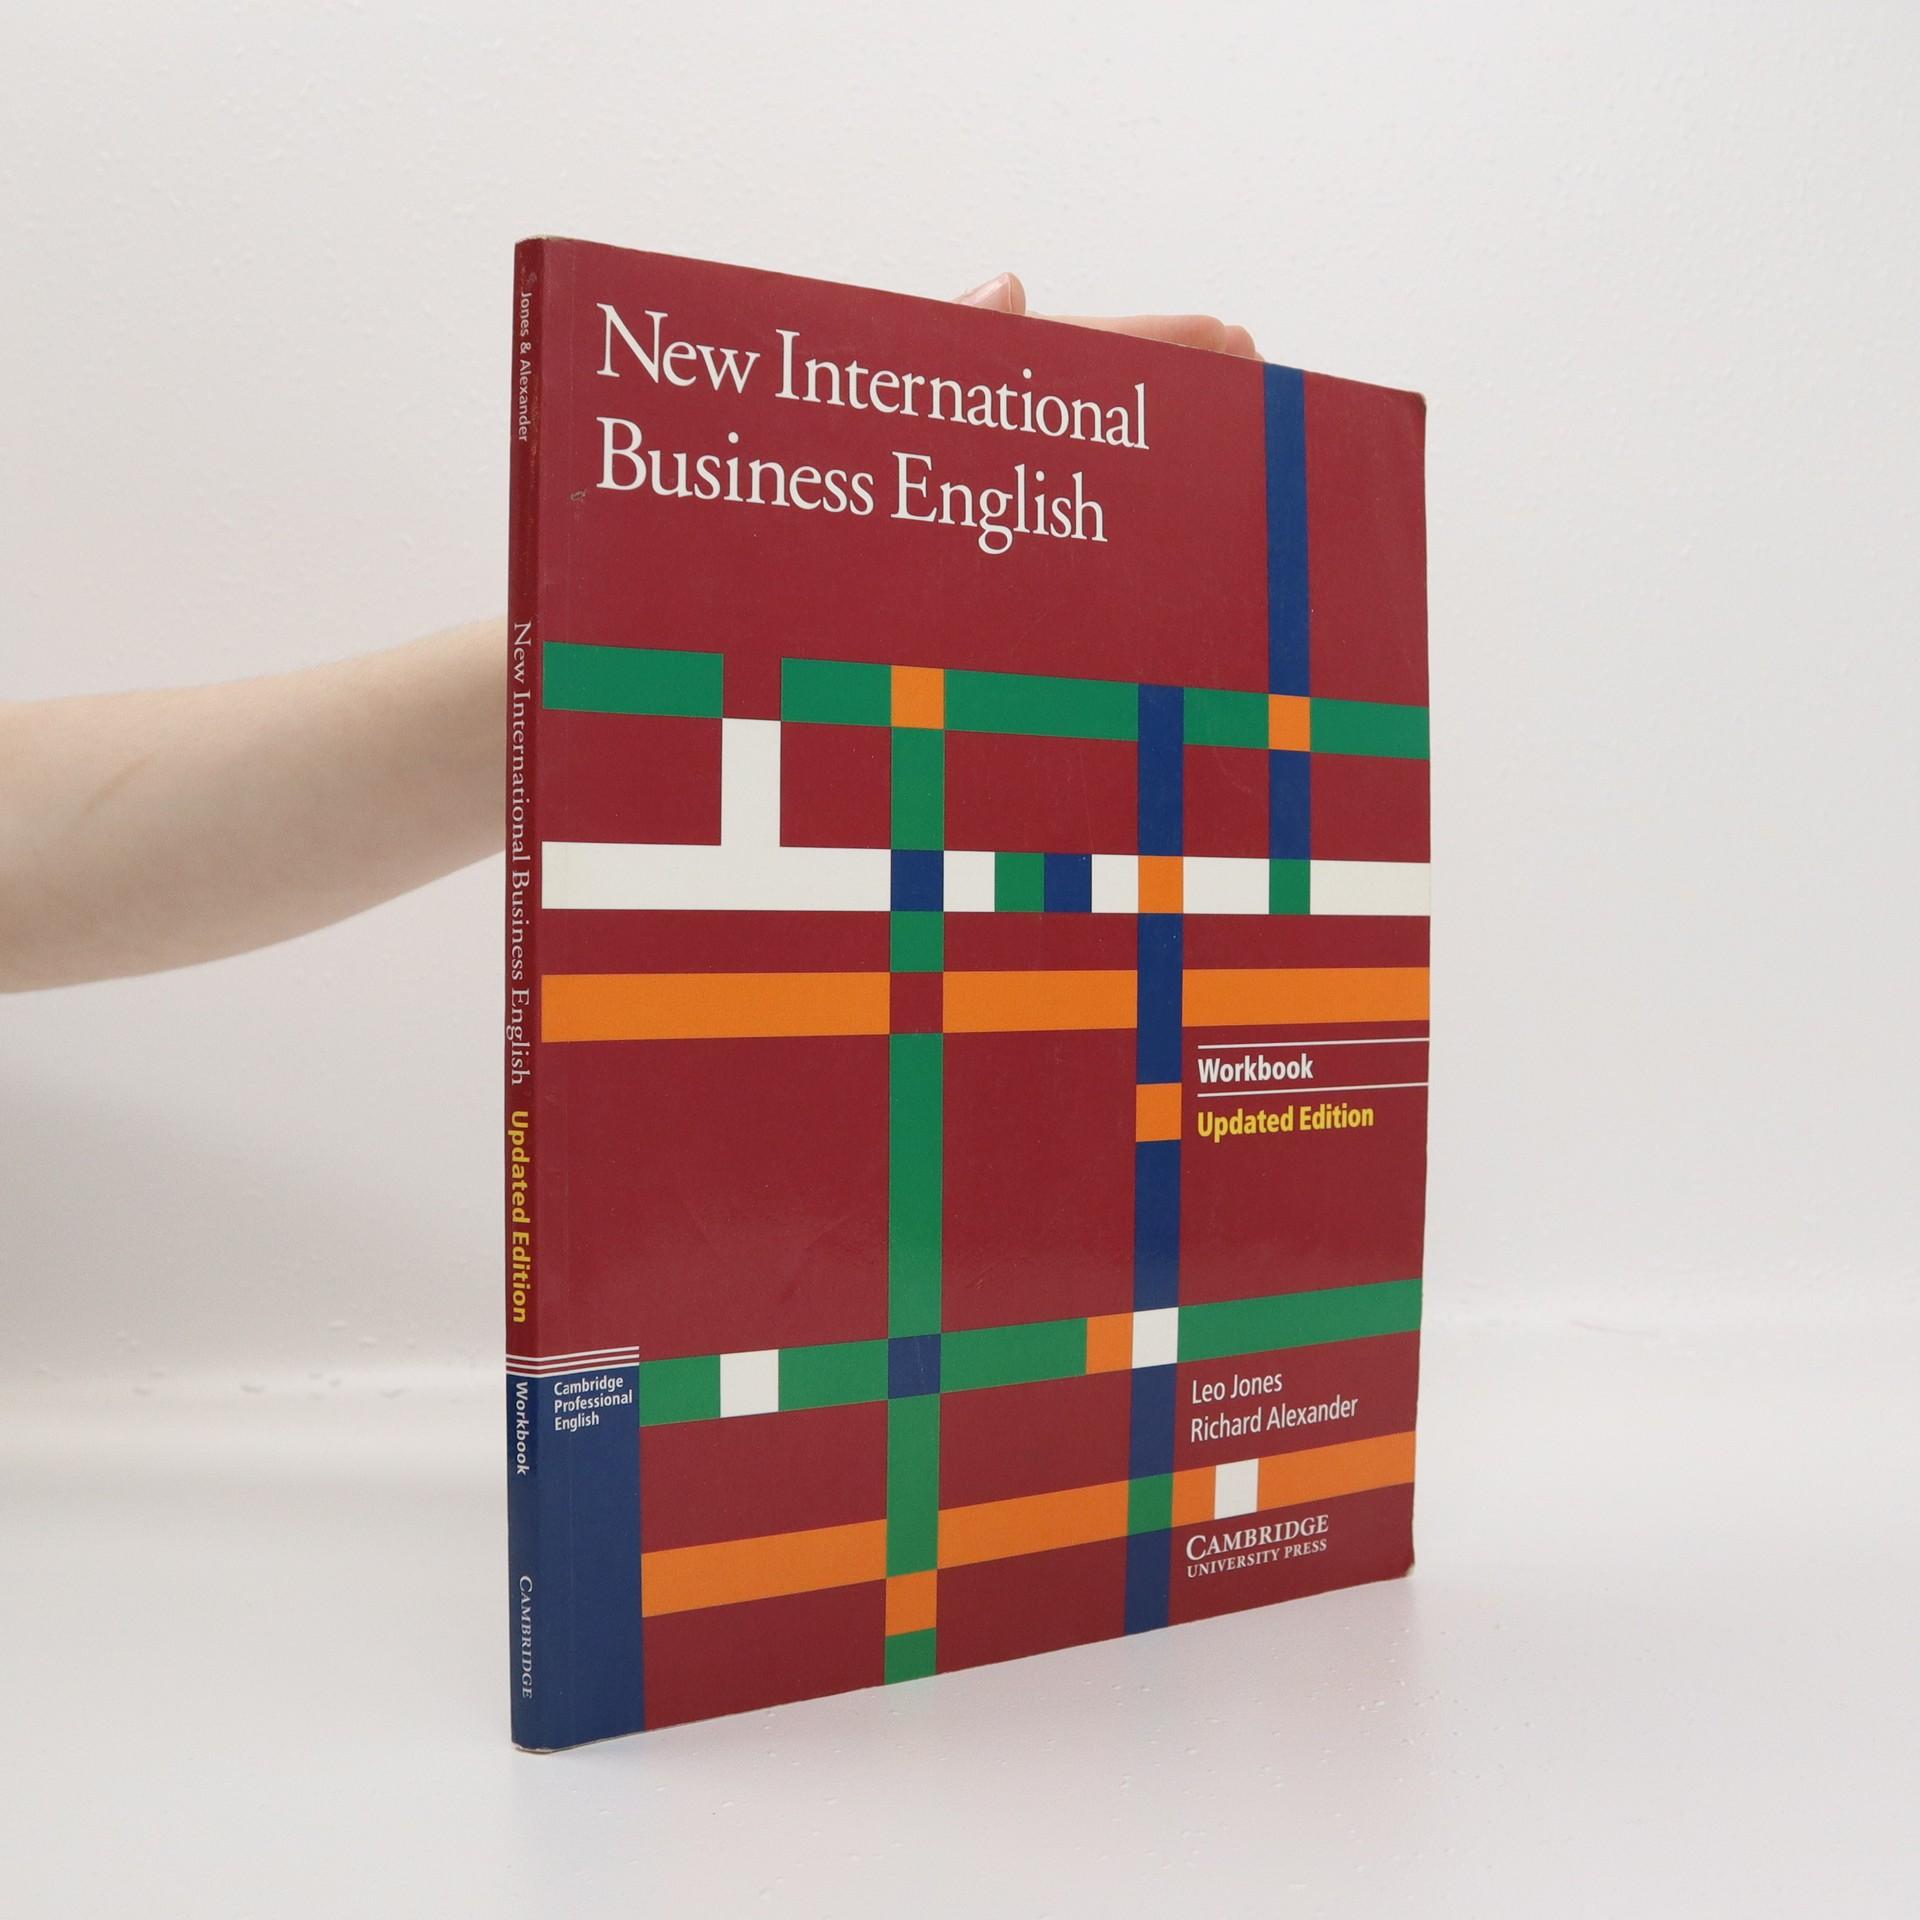 antikvární kniha New international business English :  Workbook, 2000